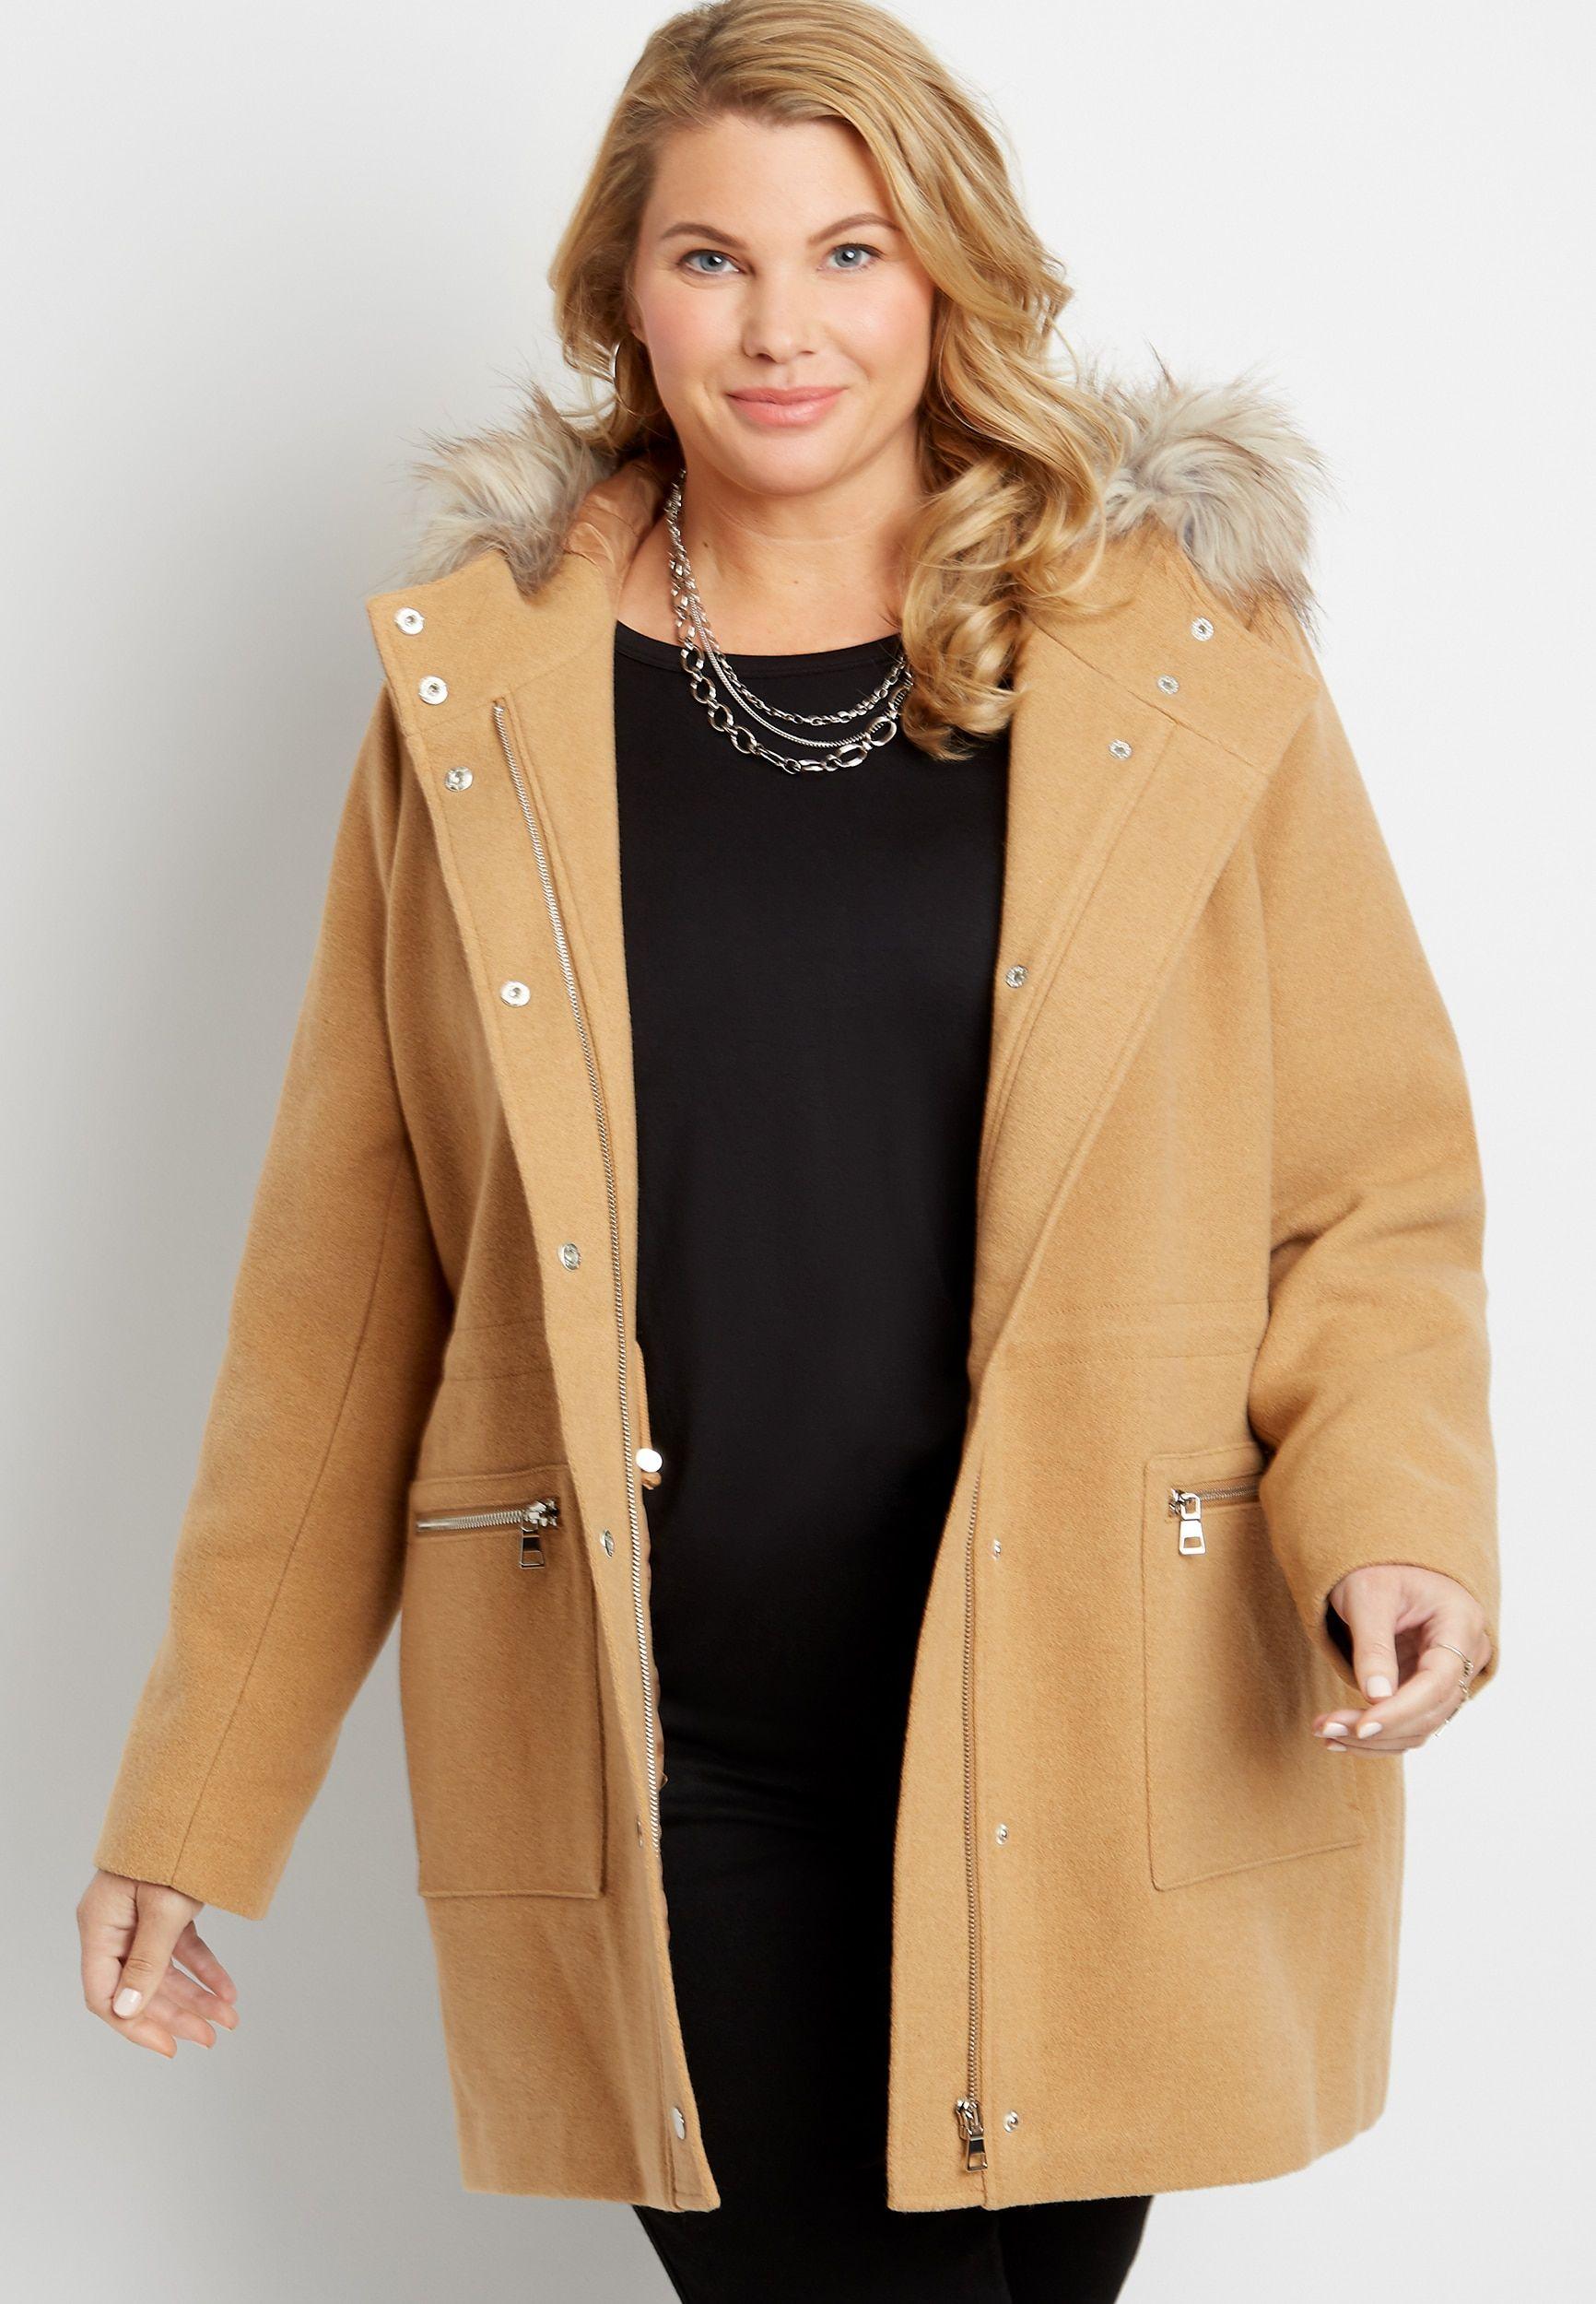 Plus Size Solid Faux Fur Trim Hooded Outerwear Jacket Hooded Outerwear Outerwear Jackets Plus Size Outerwear [ 2500 x 1732 Pixel ]